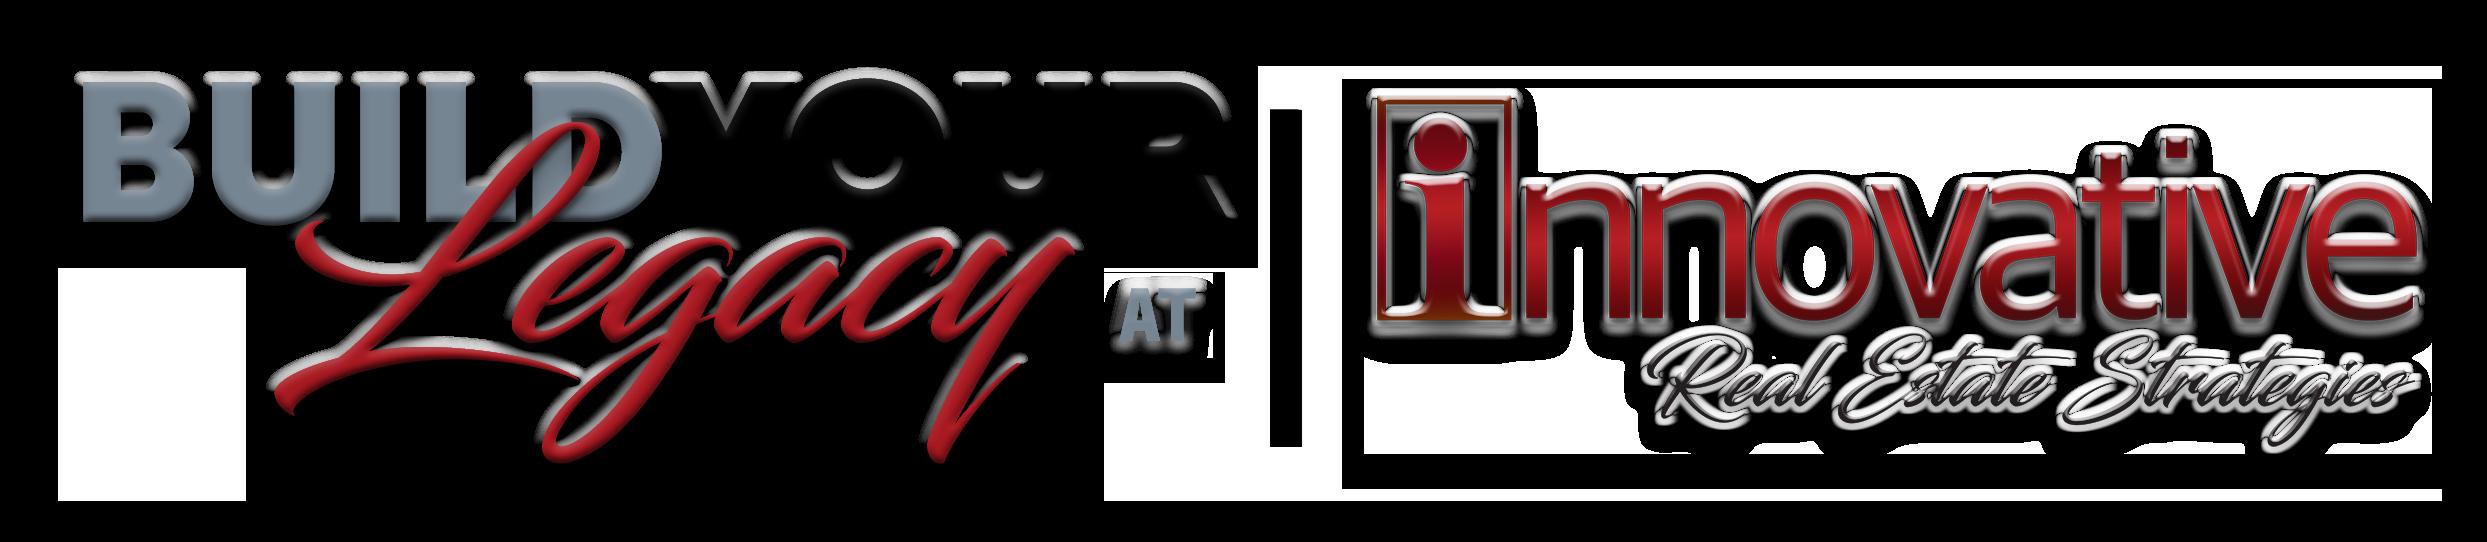 BYL_Campaign Logo_Horizontal.png